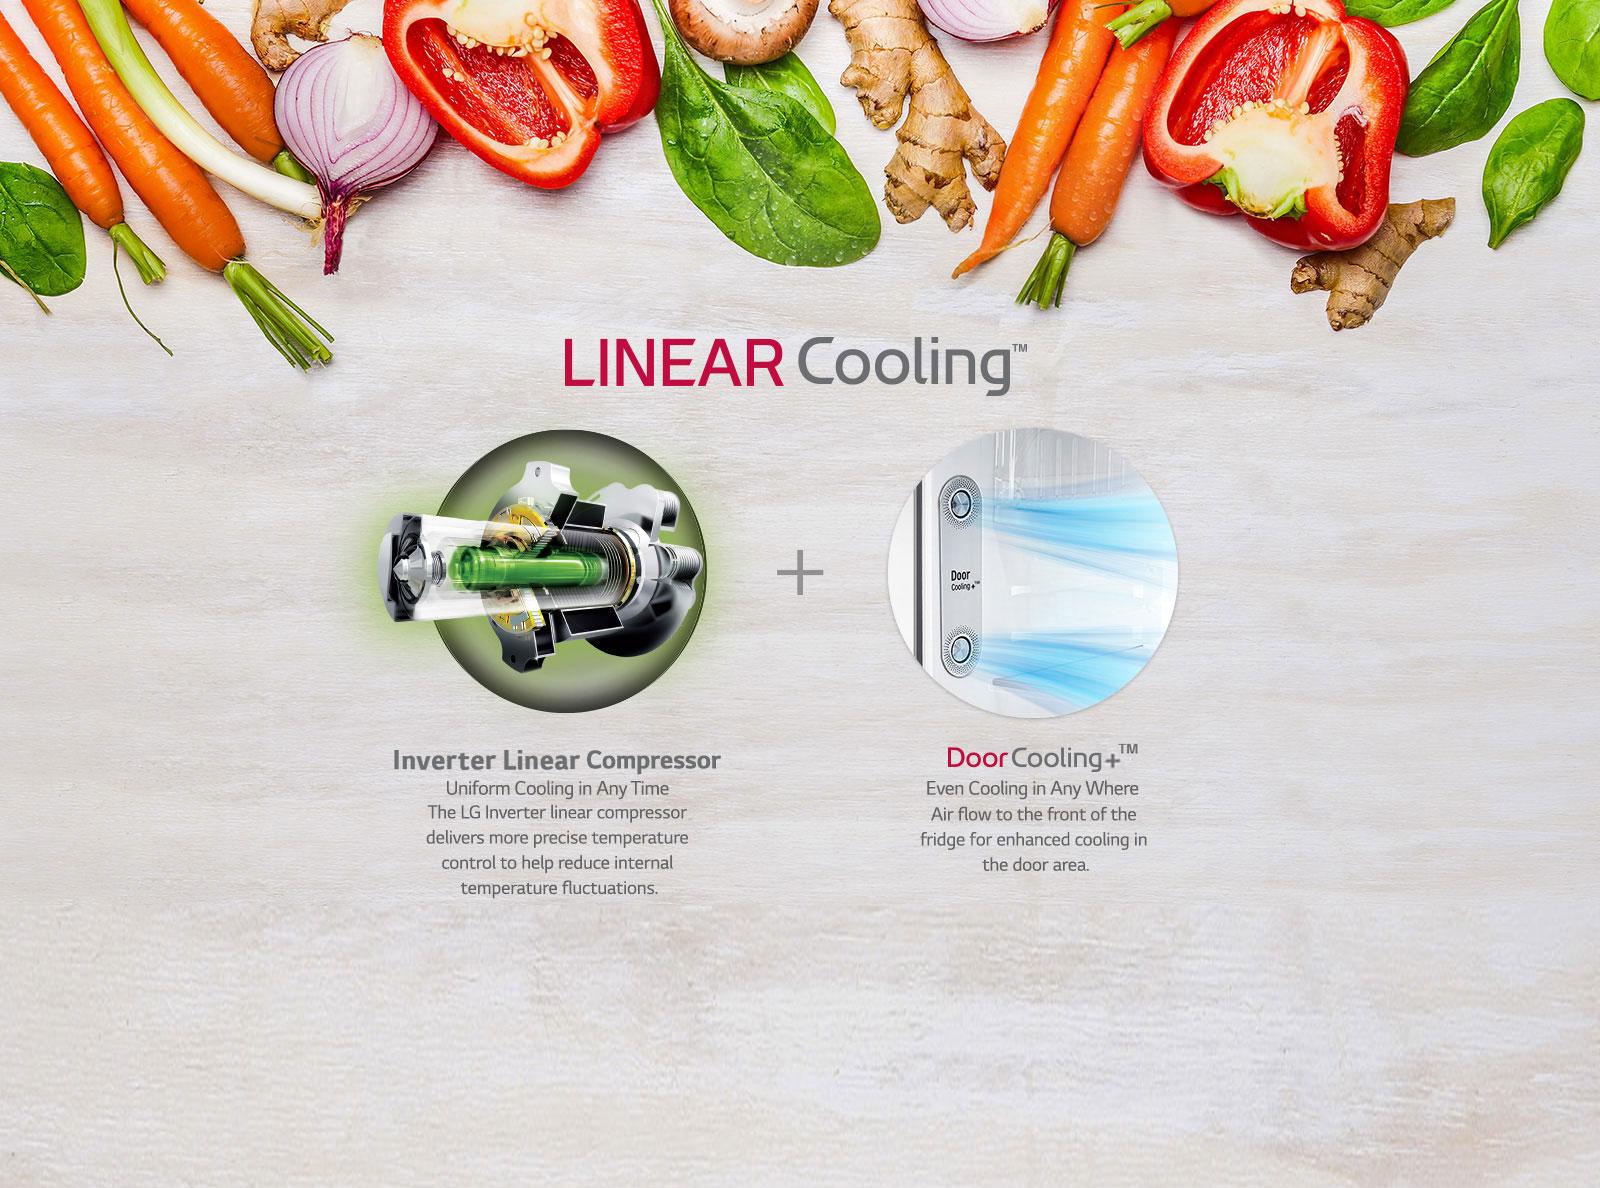 LG GL-T372JES3 335 Ltr Linear Cooling